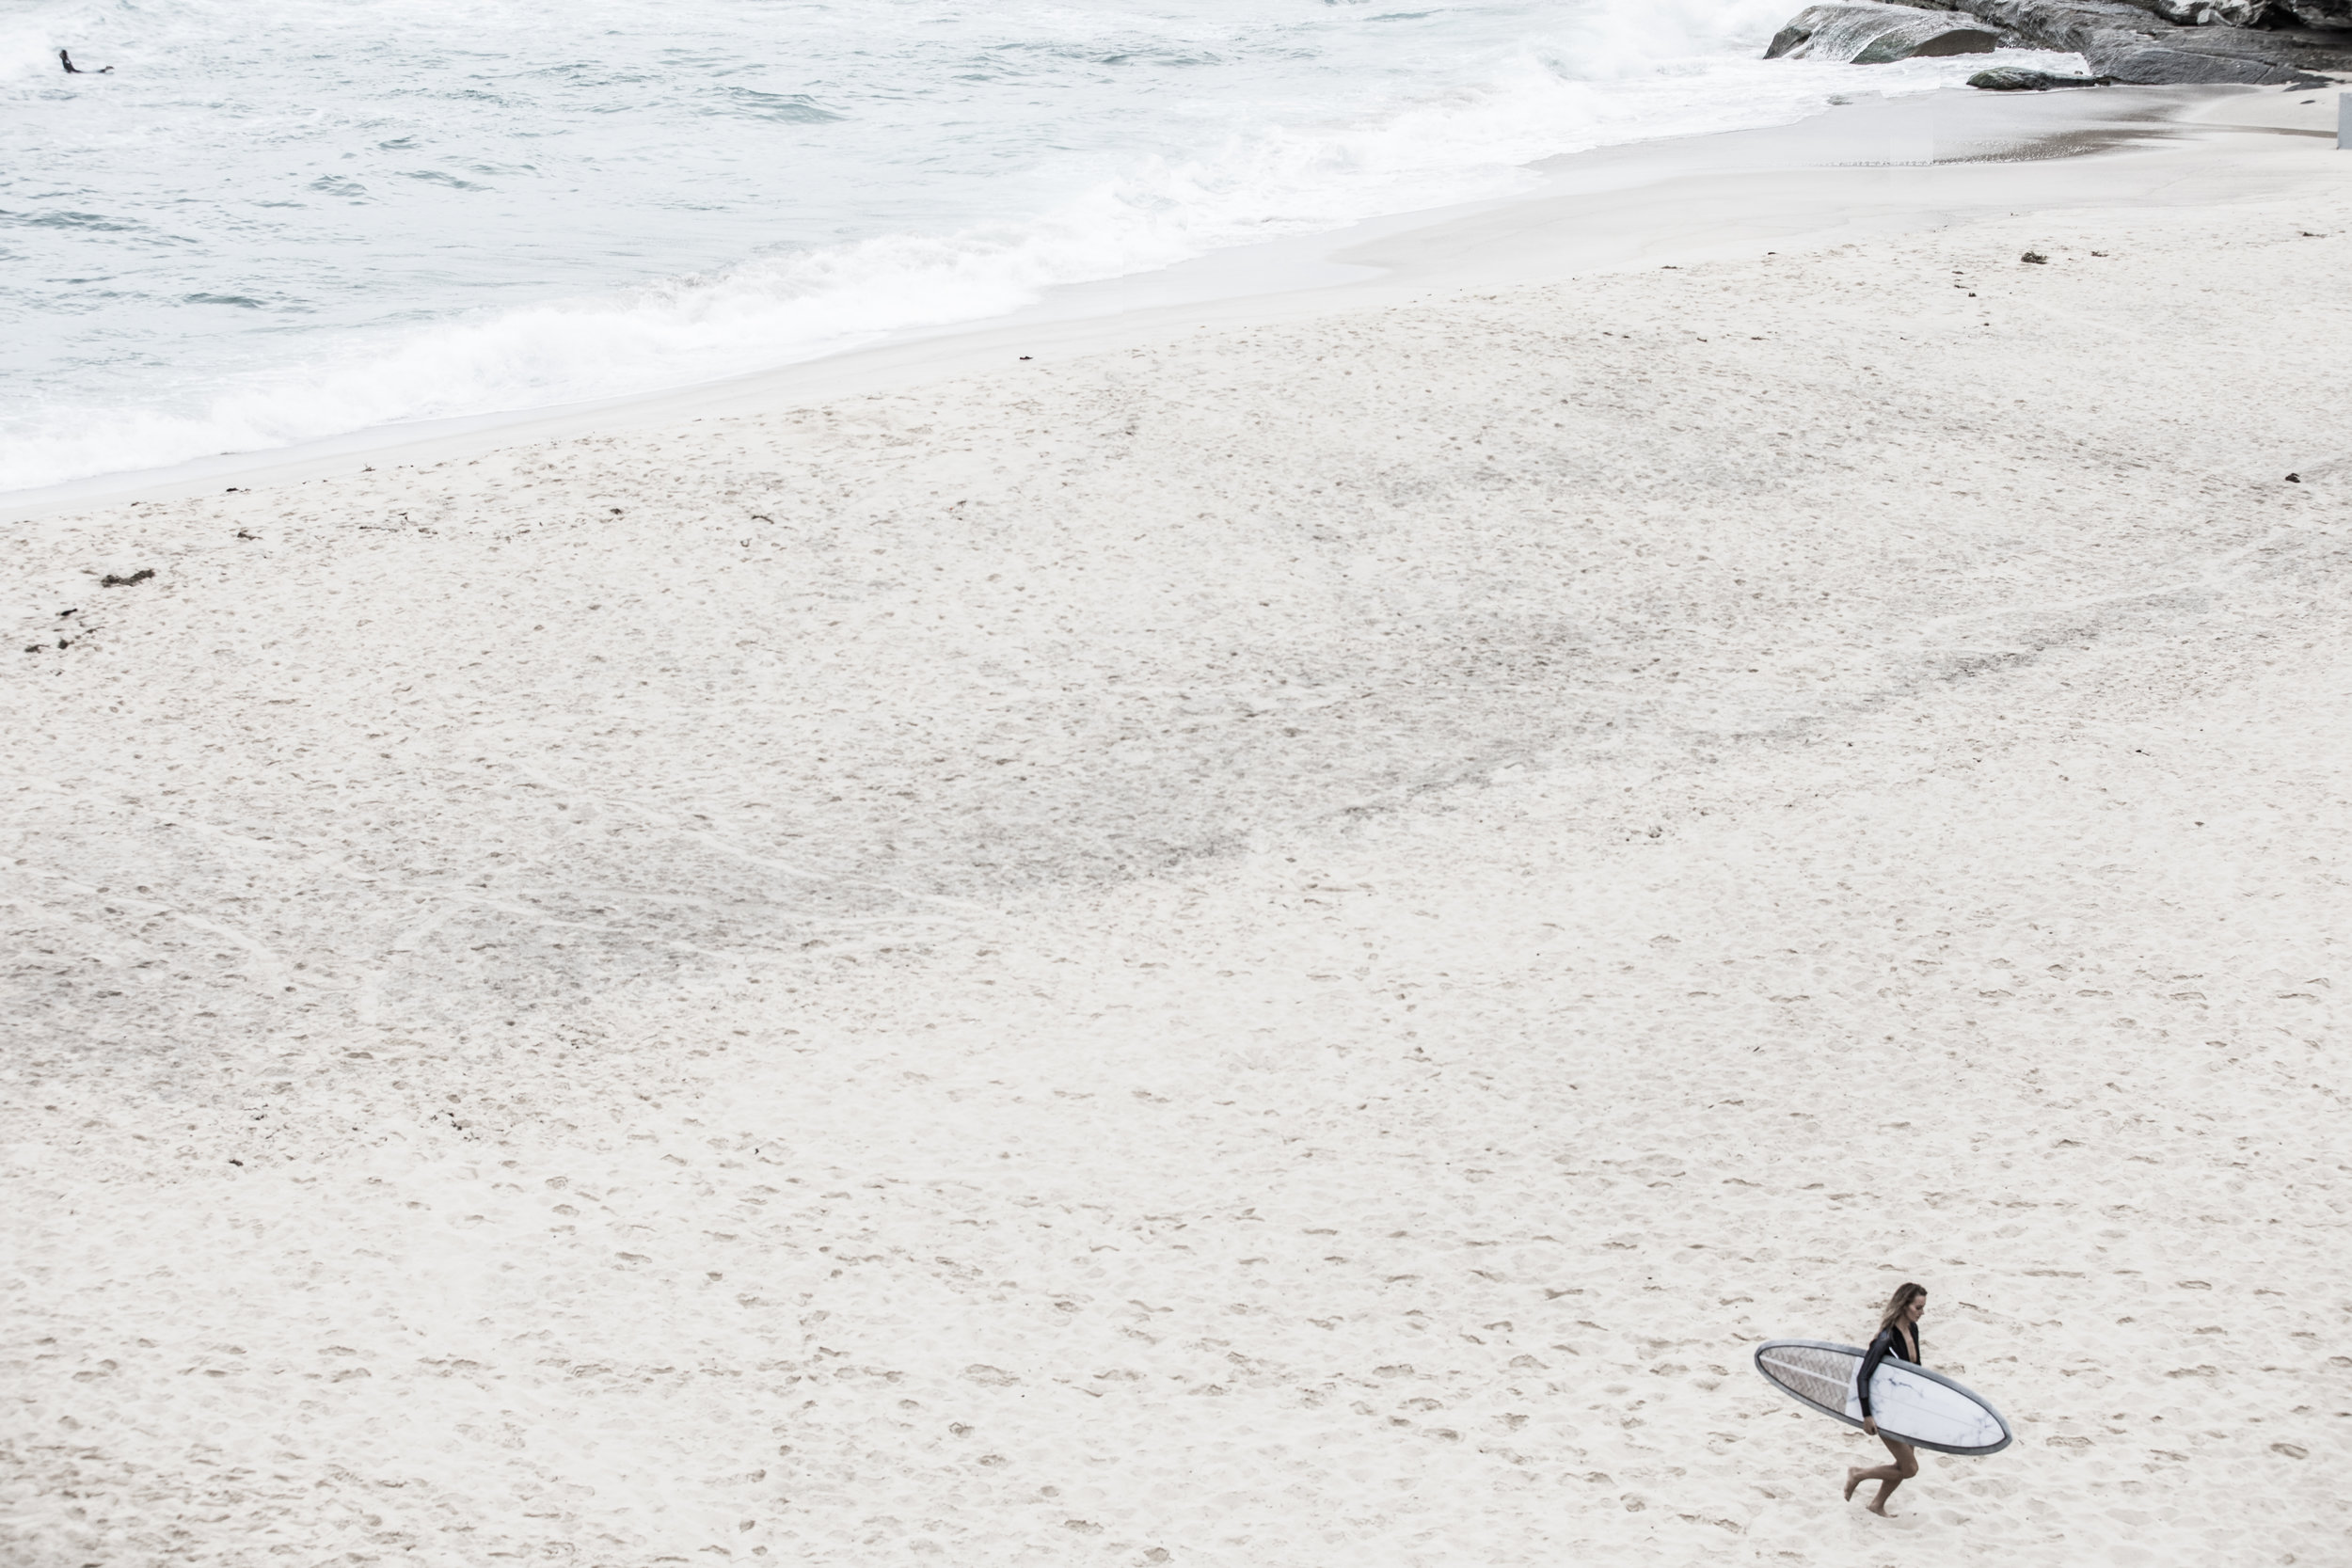 SW_SURFBOARDS_SCOTTEHLER_007.JPG